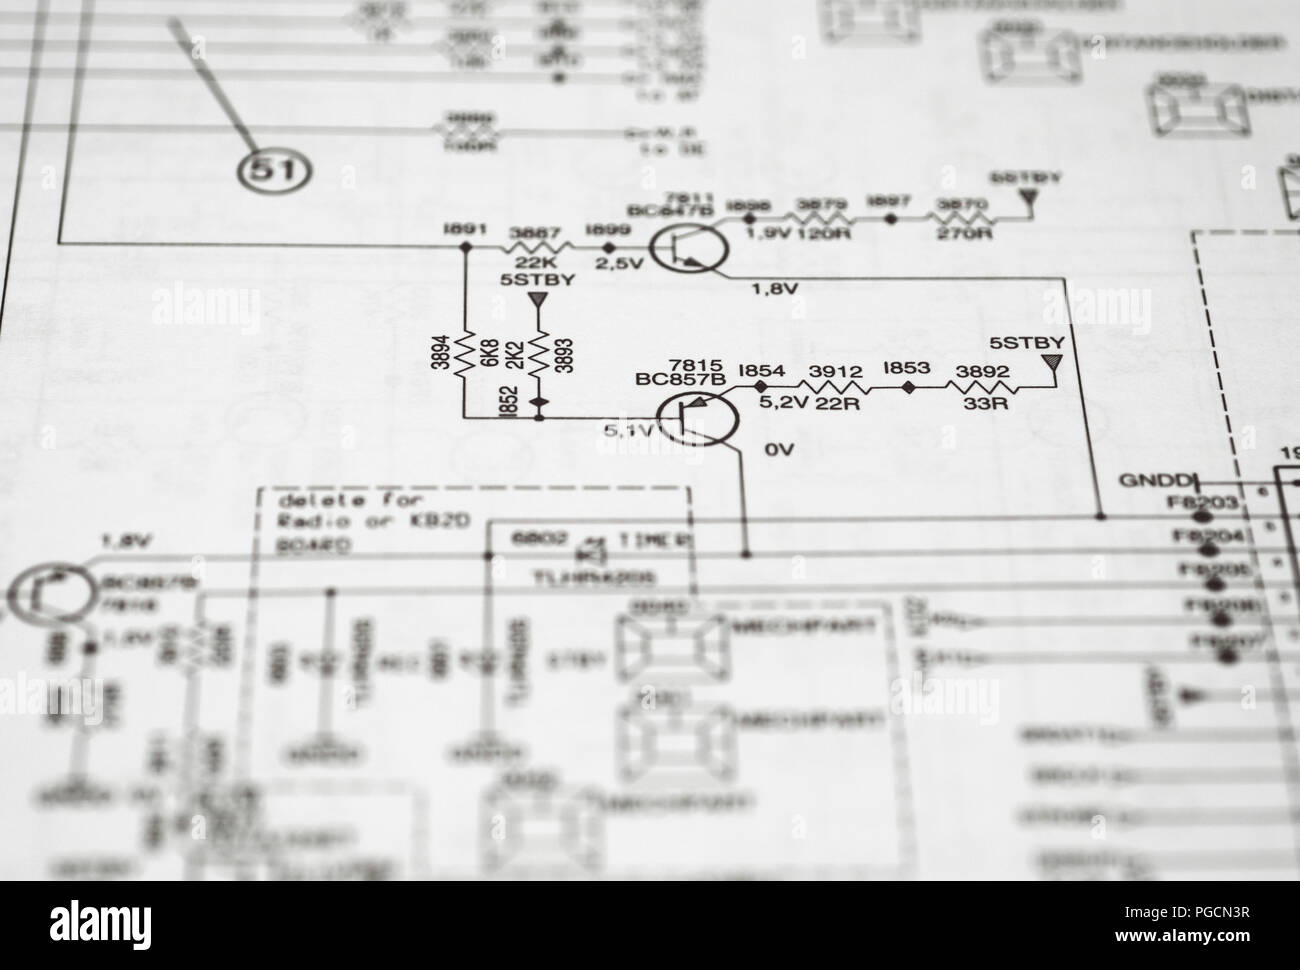 hight resolution of electronic circuit diagram stock photo 216638907 alamy stock status pin diagram pin diagram block diagram block diagram